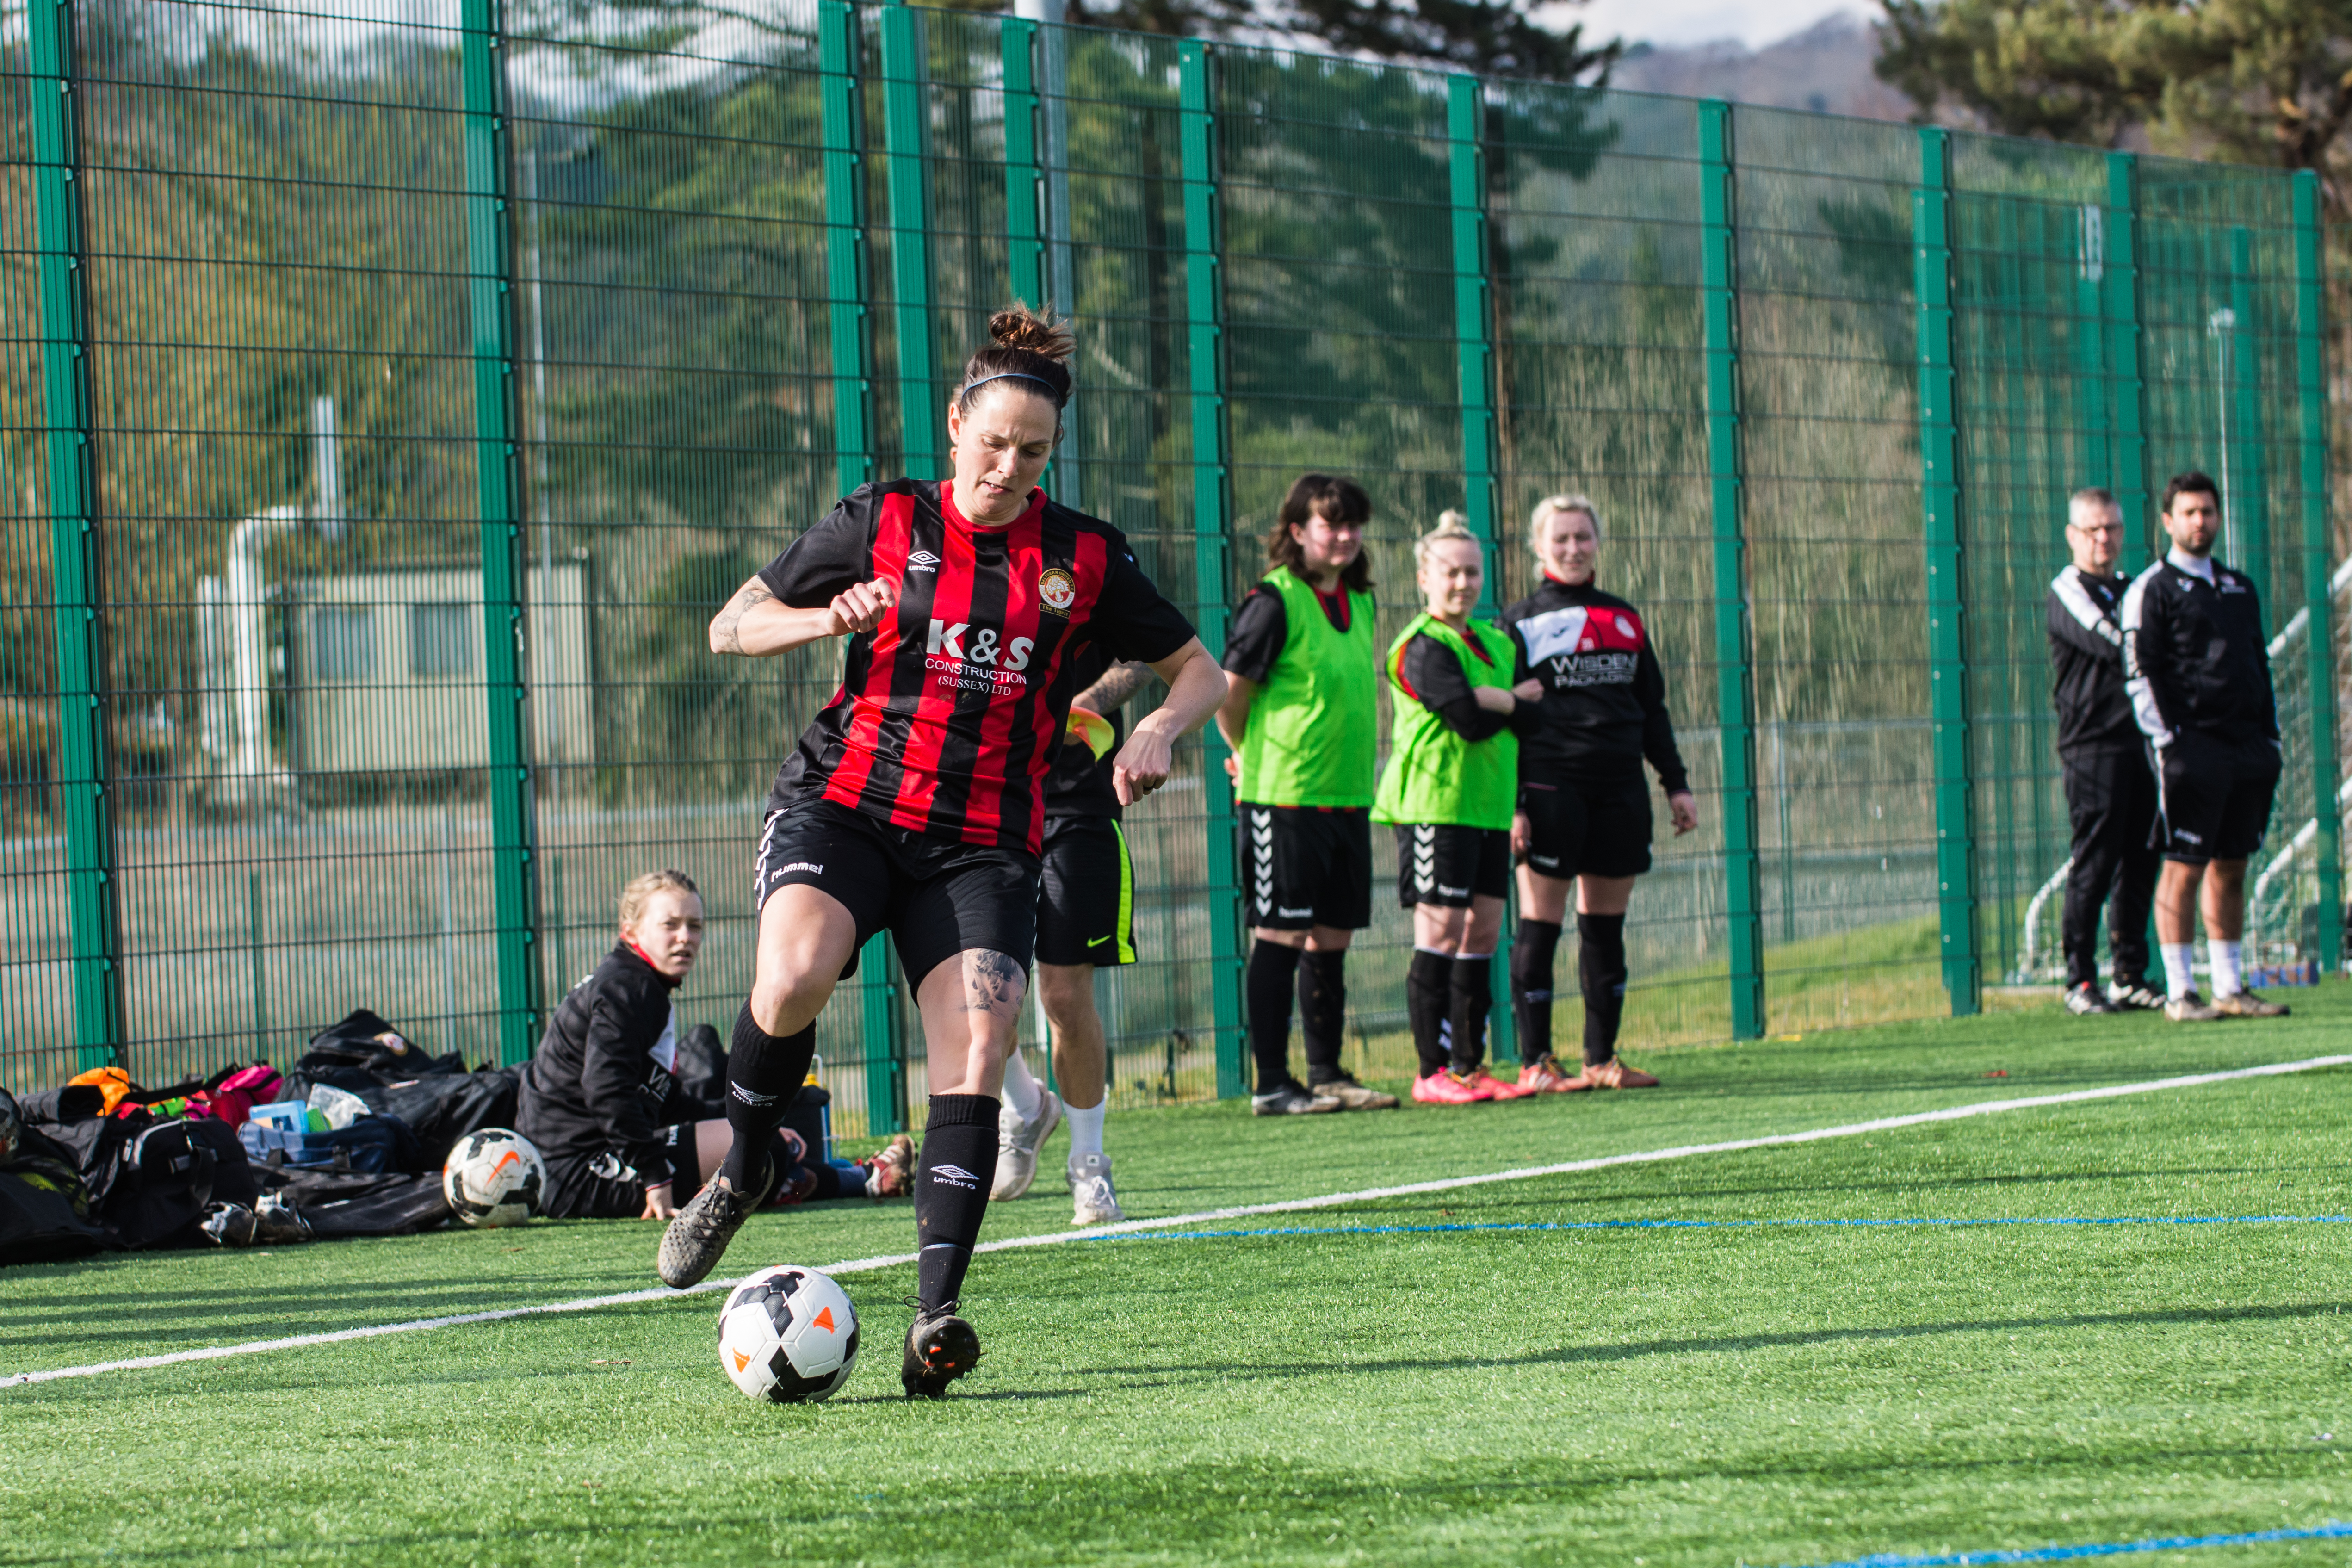 DAVID_JEFFERY Saltdean Utd Ladies FC vs Worthing Utd Ladies FC 11.03.18 08